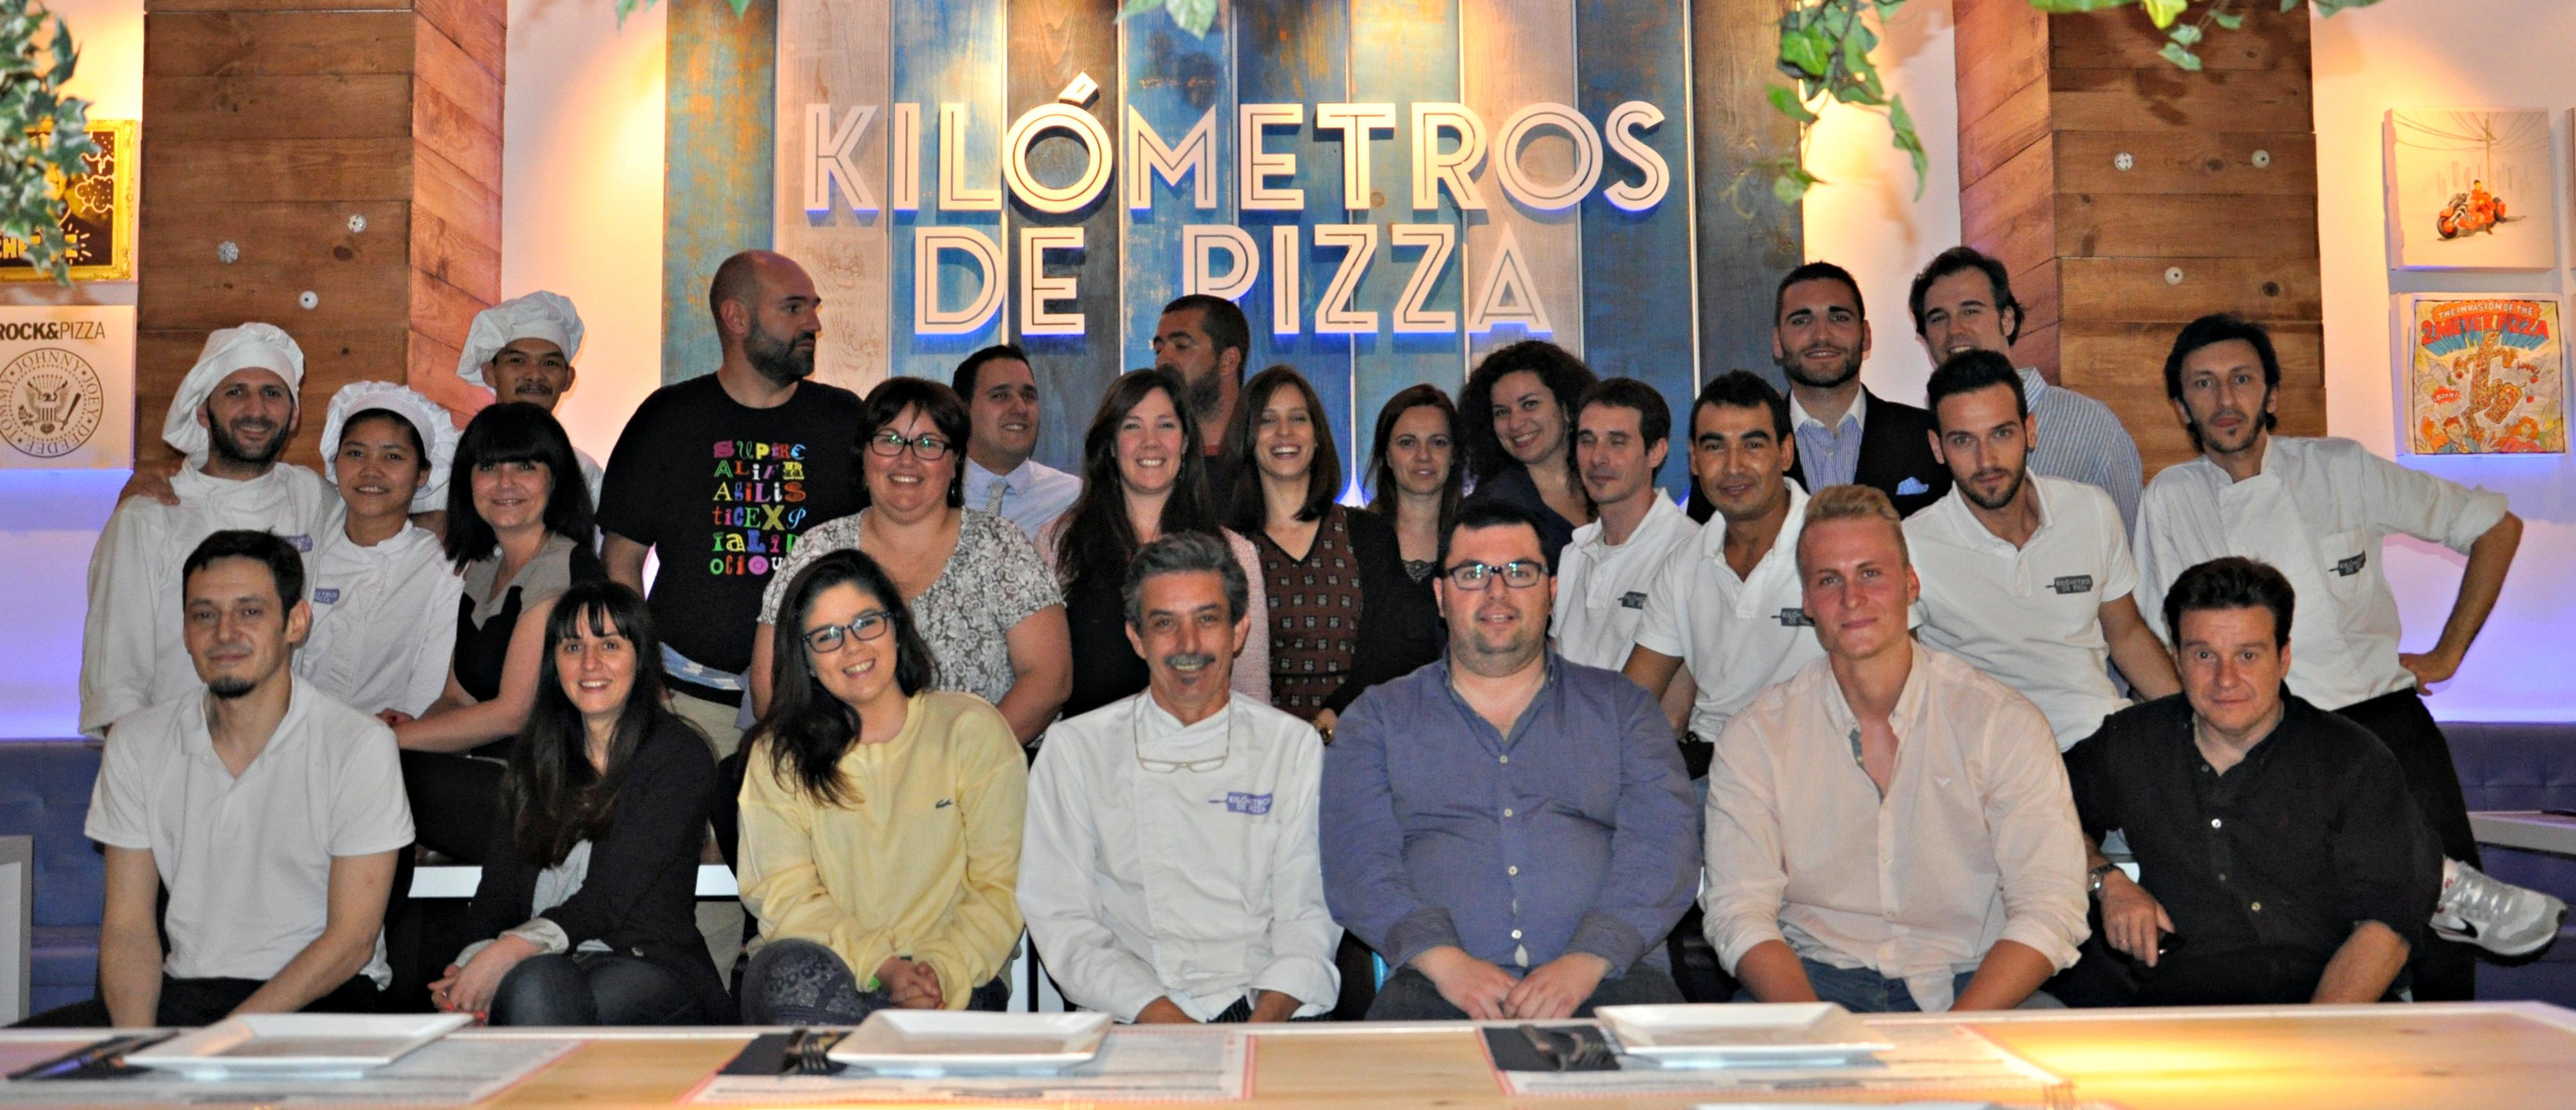 bloggers - equipo kilometros de pizza.jpg